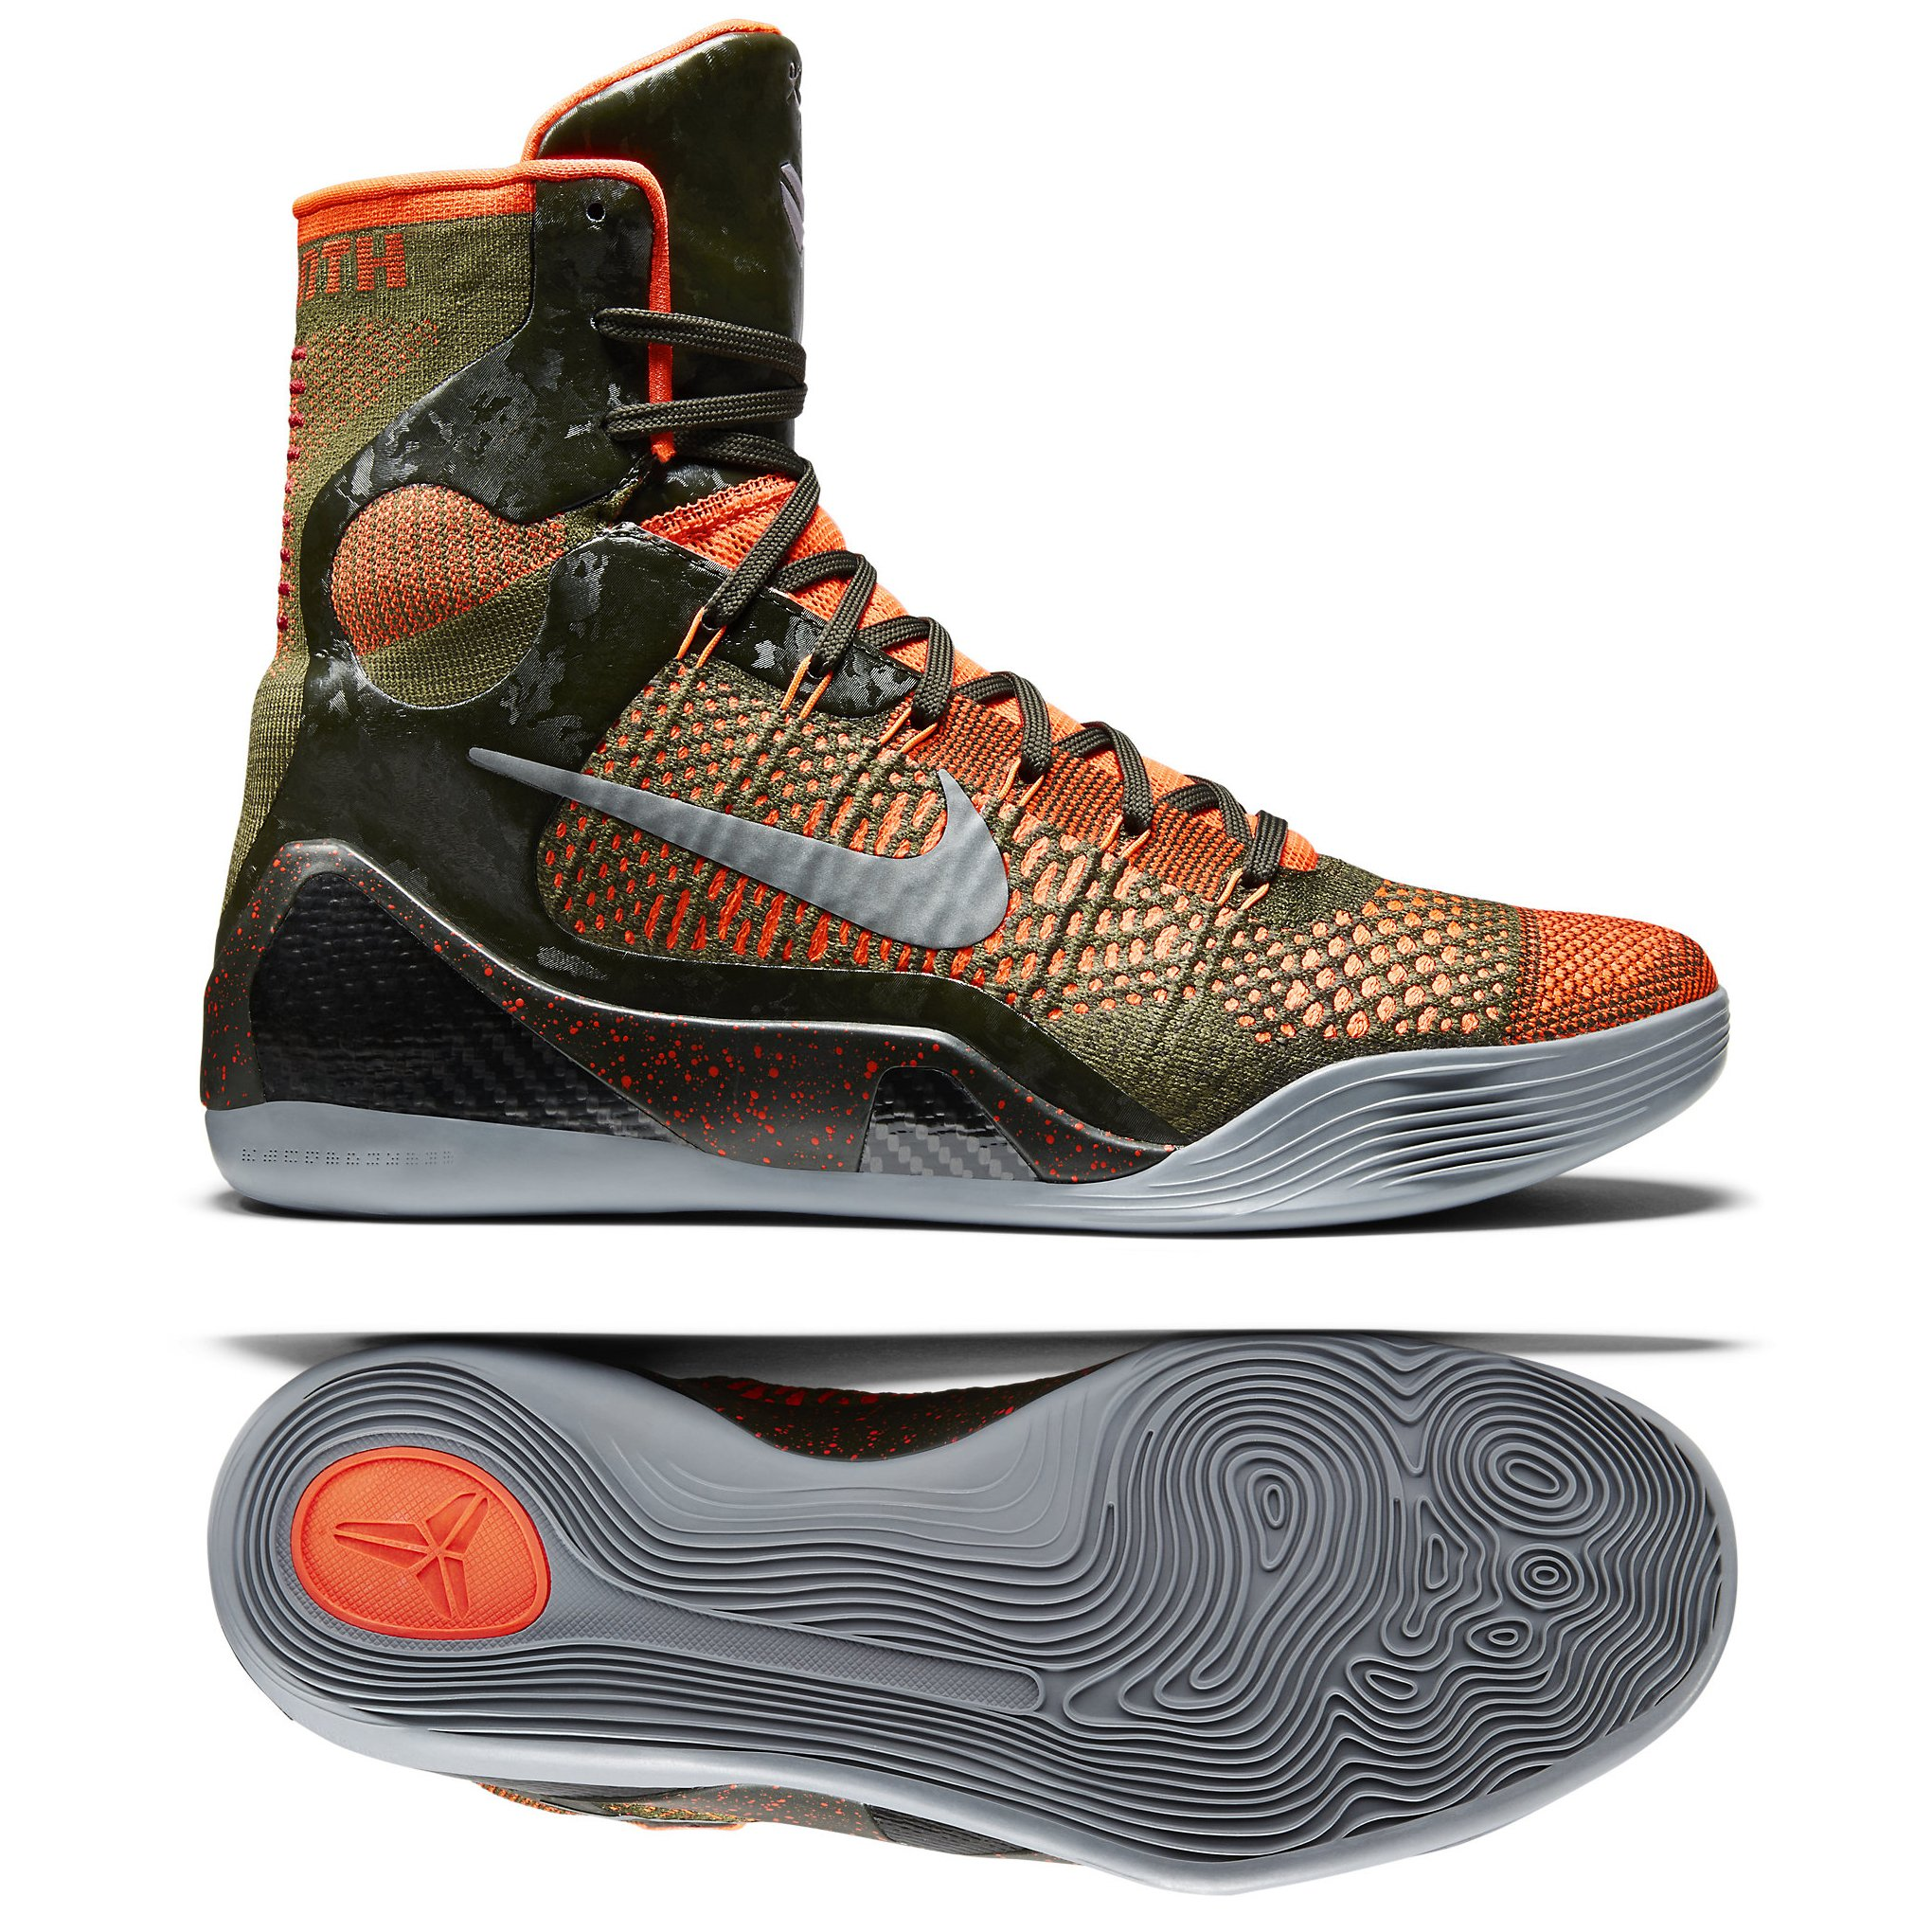 big sale f1465 b113e Galleon - Nike Kobe IX 9 Elite Strategy 630847-303 Sequoia Green Silver  Mens Basketball Shoes (size 11.5)